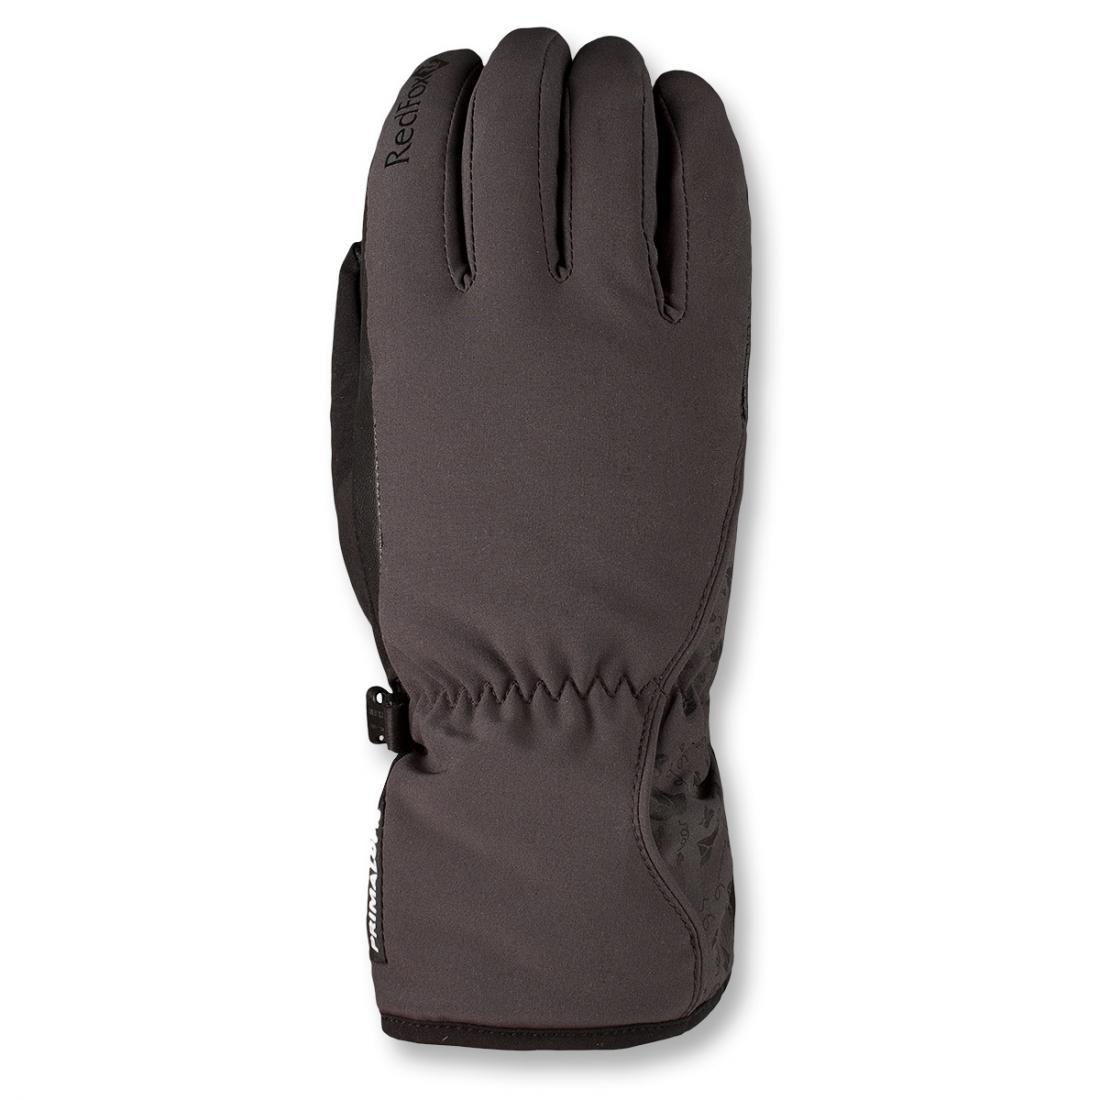 Перчатки женские RozaryПерчатки<br><br> Женская версия зимних прогулочных перчаток с утеплителем Primaloft®.<br><br><br> <br><br><br><br><br> Материал – Nylon DWR.<br><br> <br><br><br> Утеплитель – Primaloft®.<br><br> <br><br><br> Вставки, препятствующ...<br><br>Цвет: Черный<br>Размер: XL